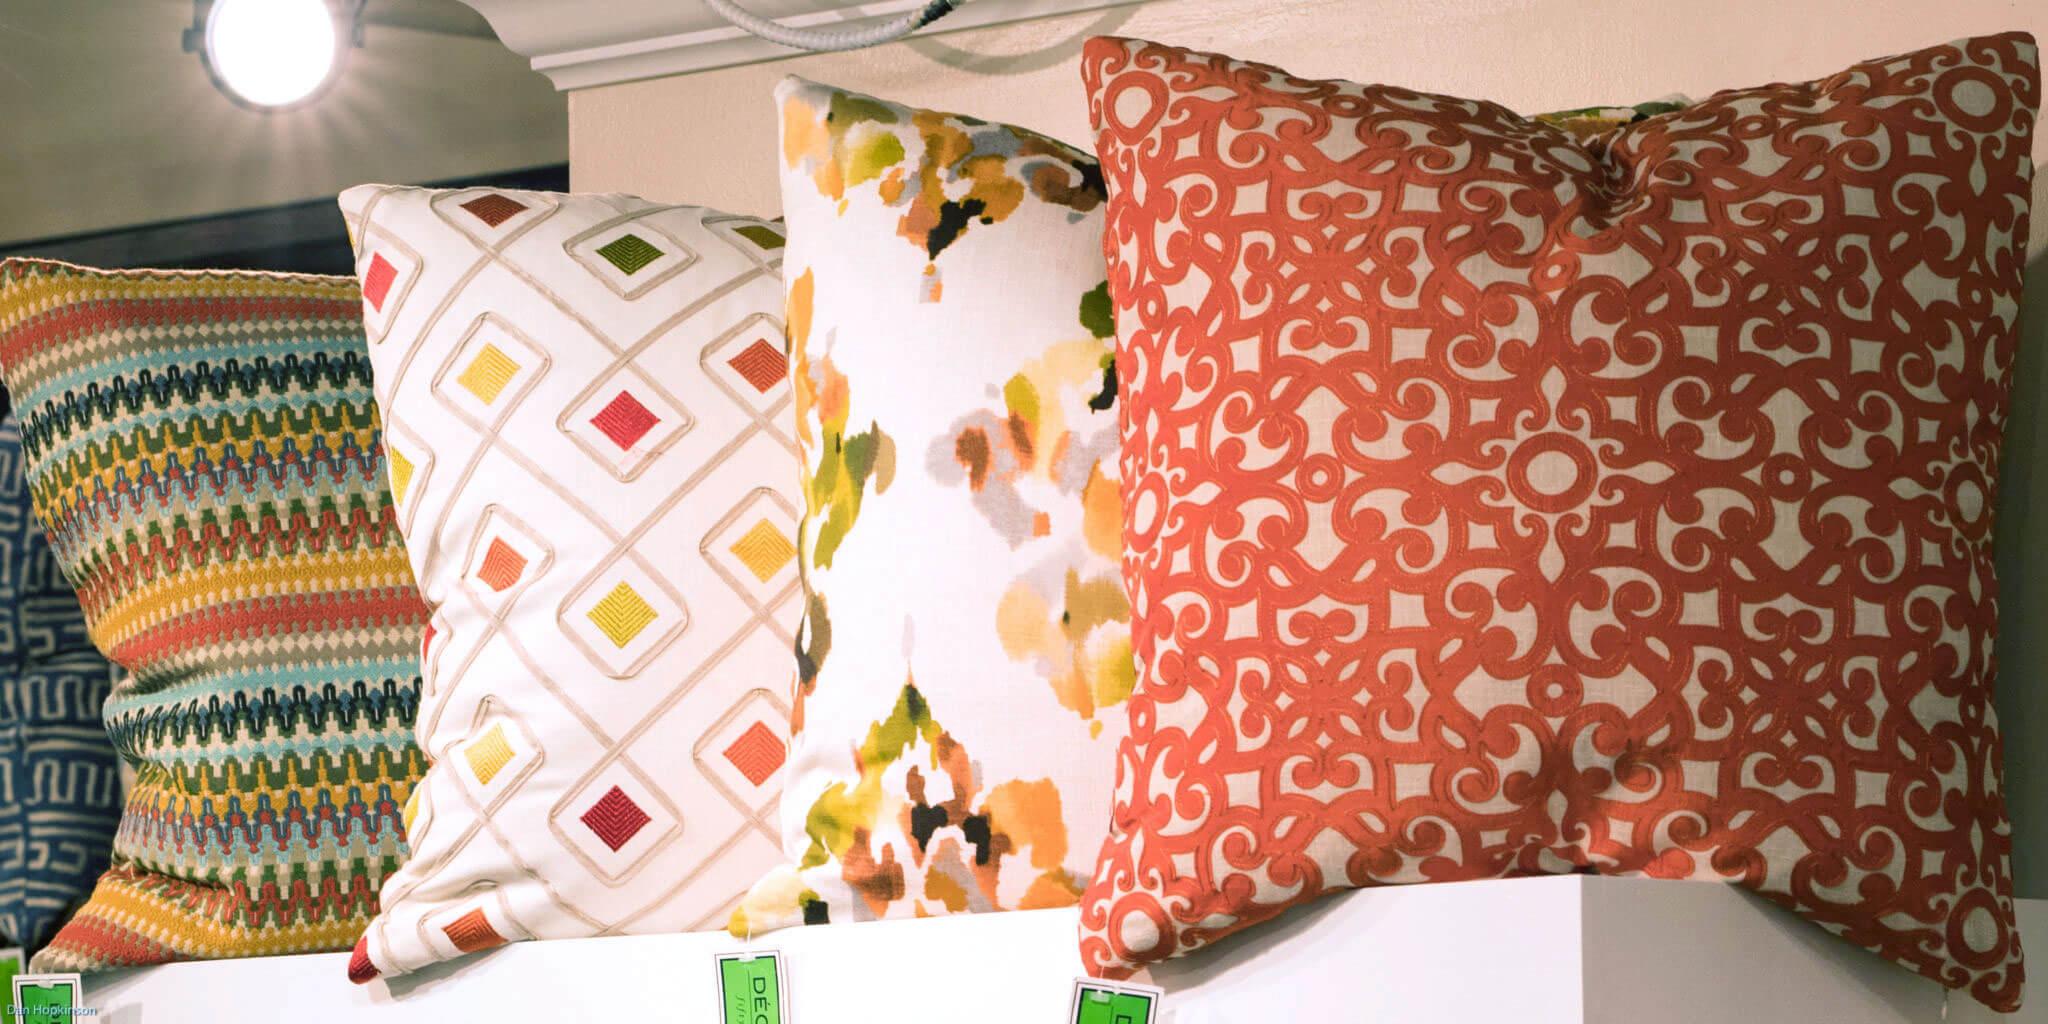 Atlanta Decorative Pillows - To the Trade Only